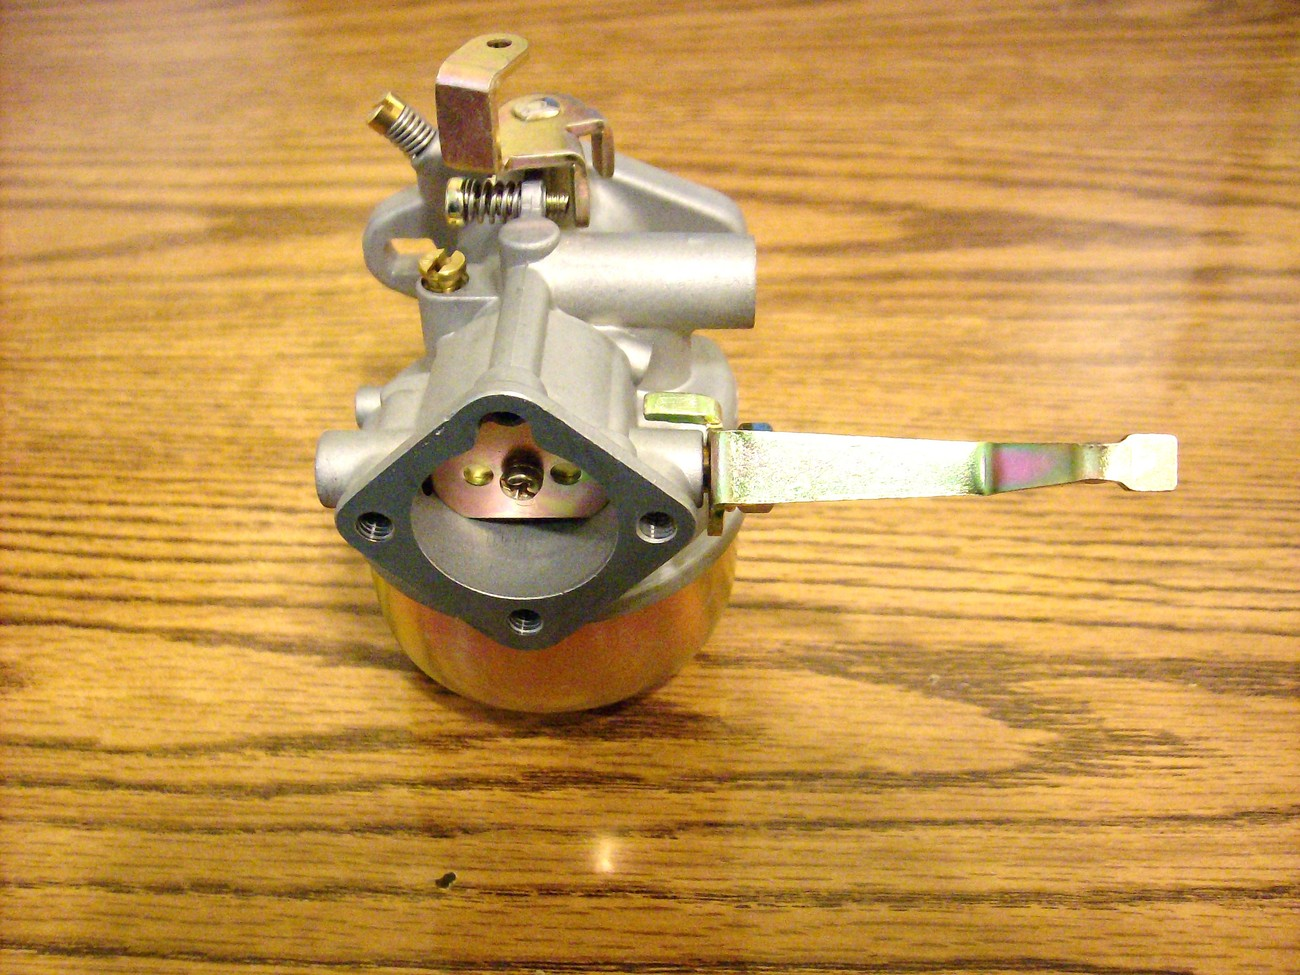 Robin EC10 engine carb carburetor 106-62516-00 - $99.98